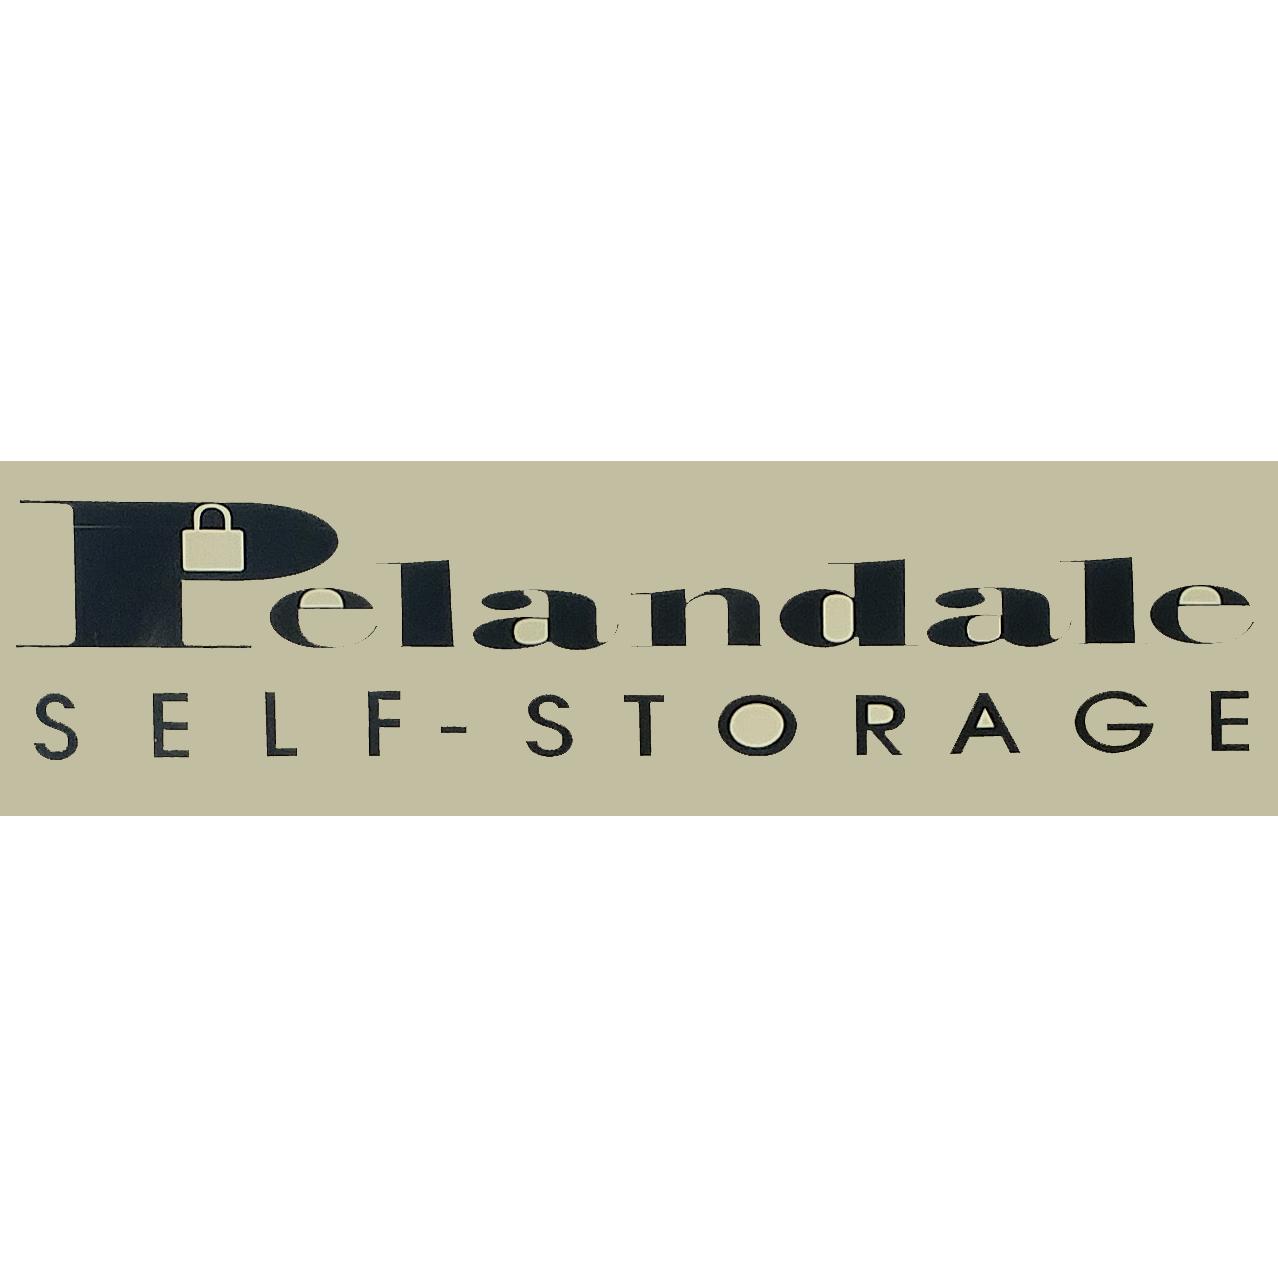 Pelandale Self Storage